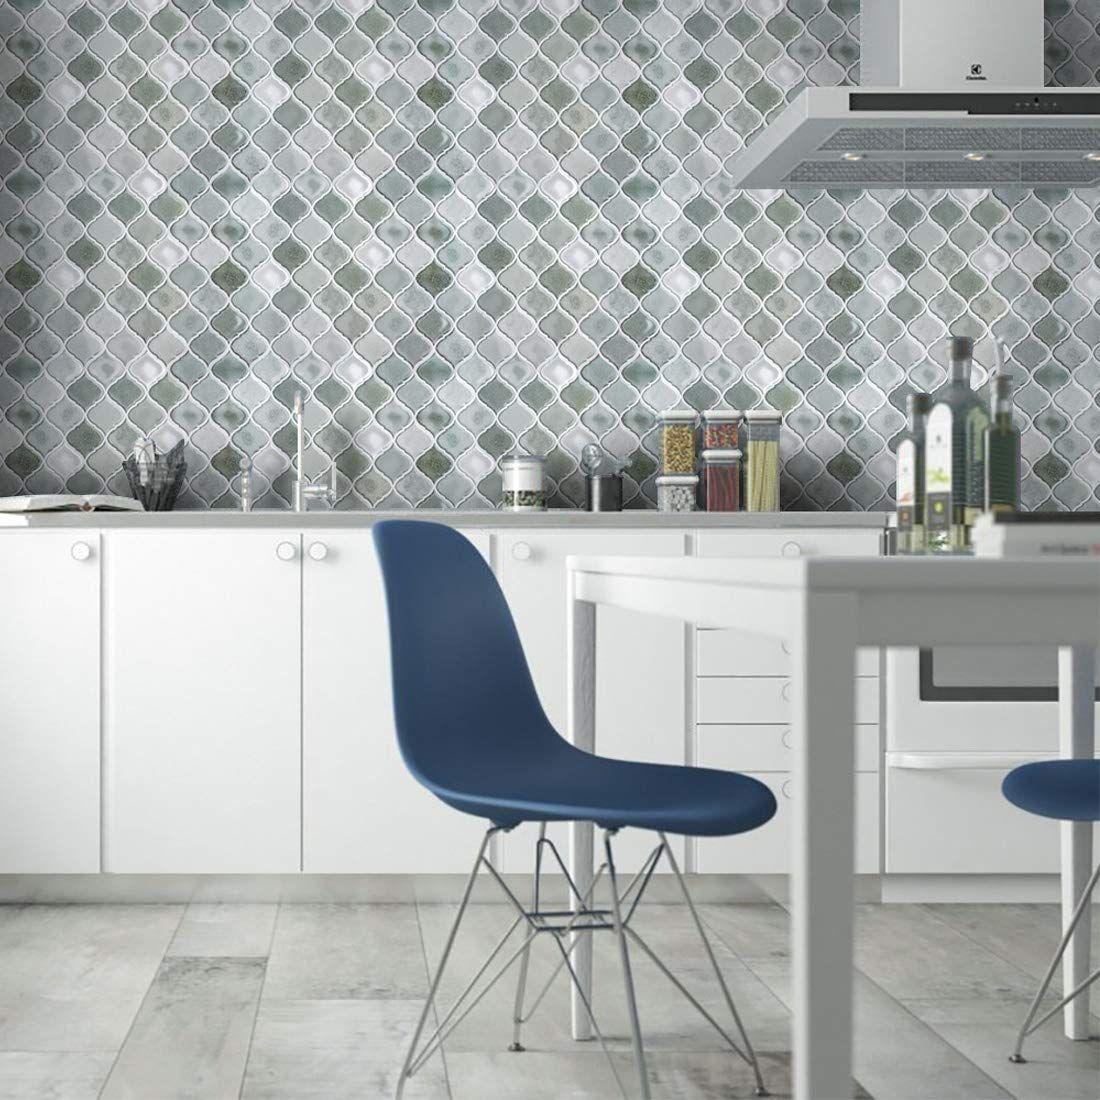 Amazon Com Peel And Stick Tile Backsplash Gray Arabesque Tile Backsplash Mosaic Backspla Decorative Wall Tiles Stick Tile Backsplash Arabesque Tile Backsplash